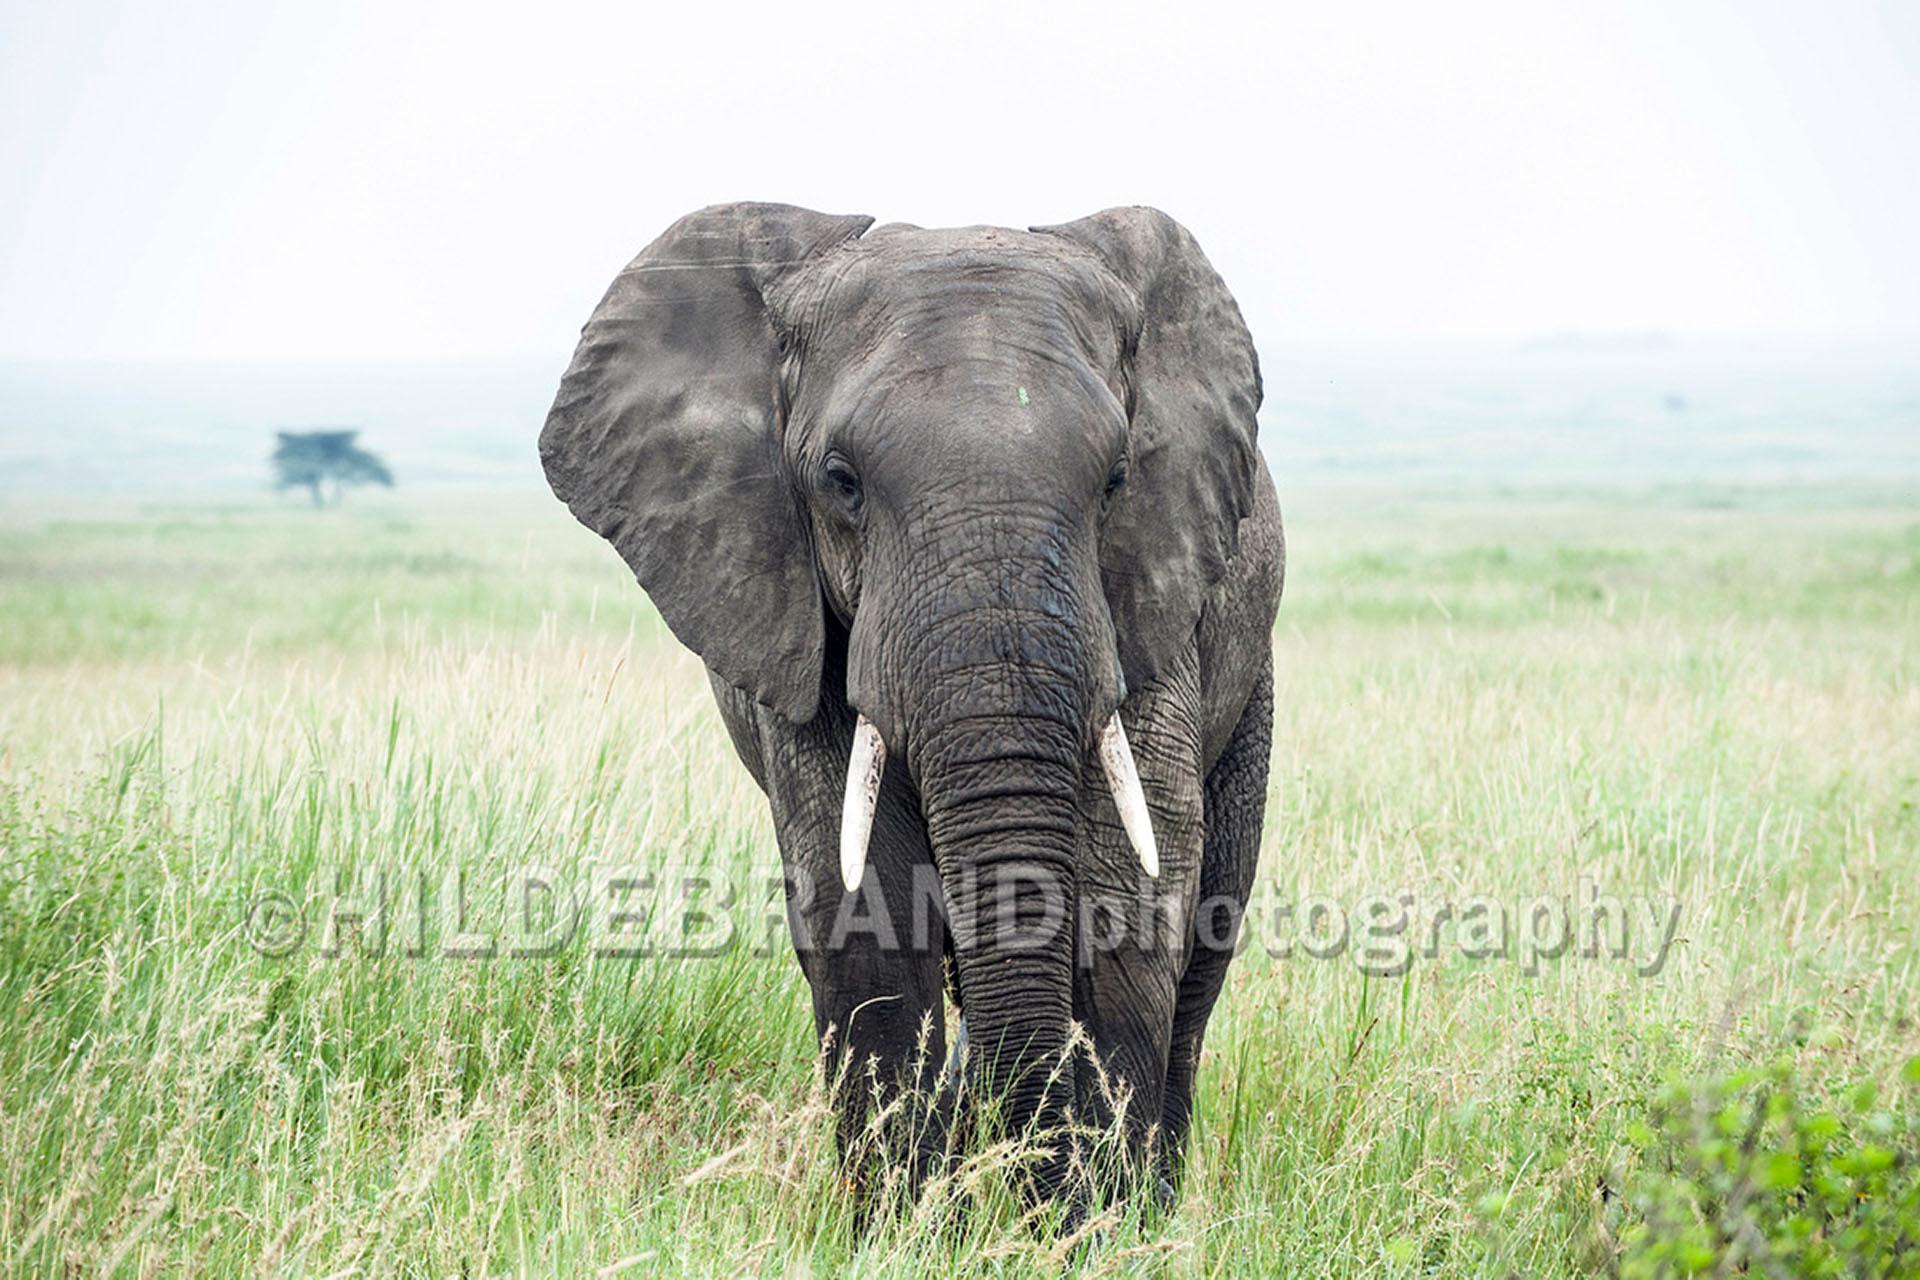 frank-hildebrand-photography-signature-photo-safaris-maasai-wanderings-africa-wildlife-elephant